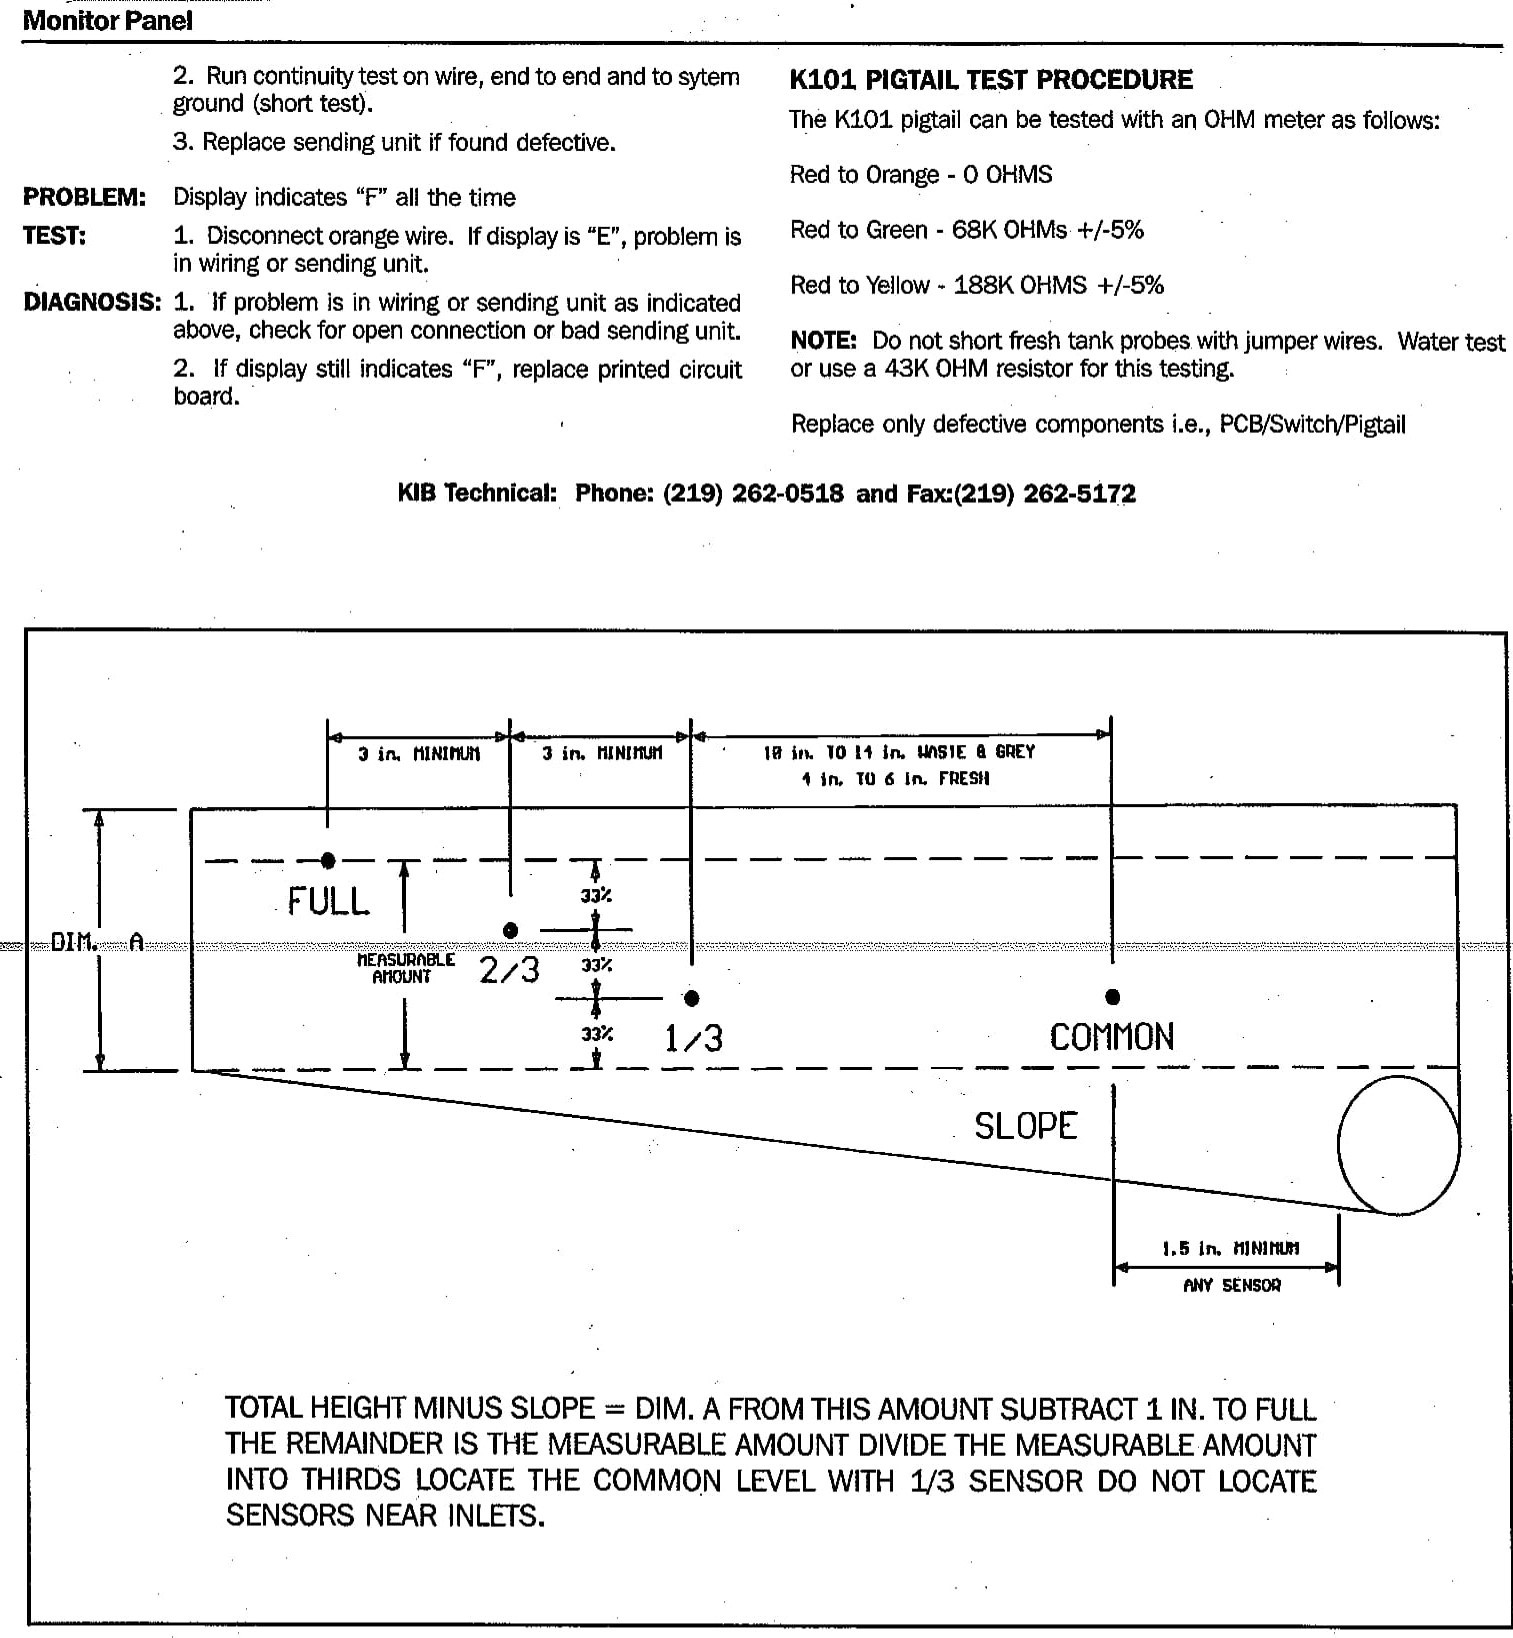 Kib Monitor Panel Manual Cd79 Kib Monitor Wiring Diagram Of Kib Monitor Panel Manual